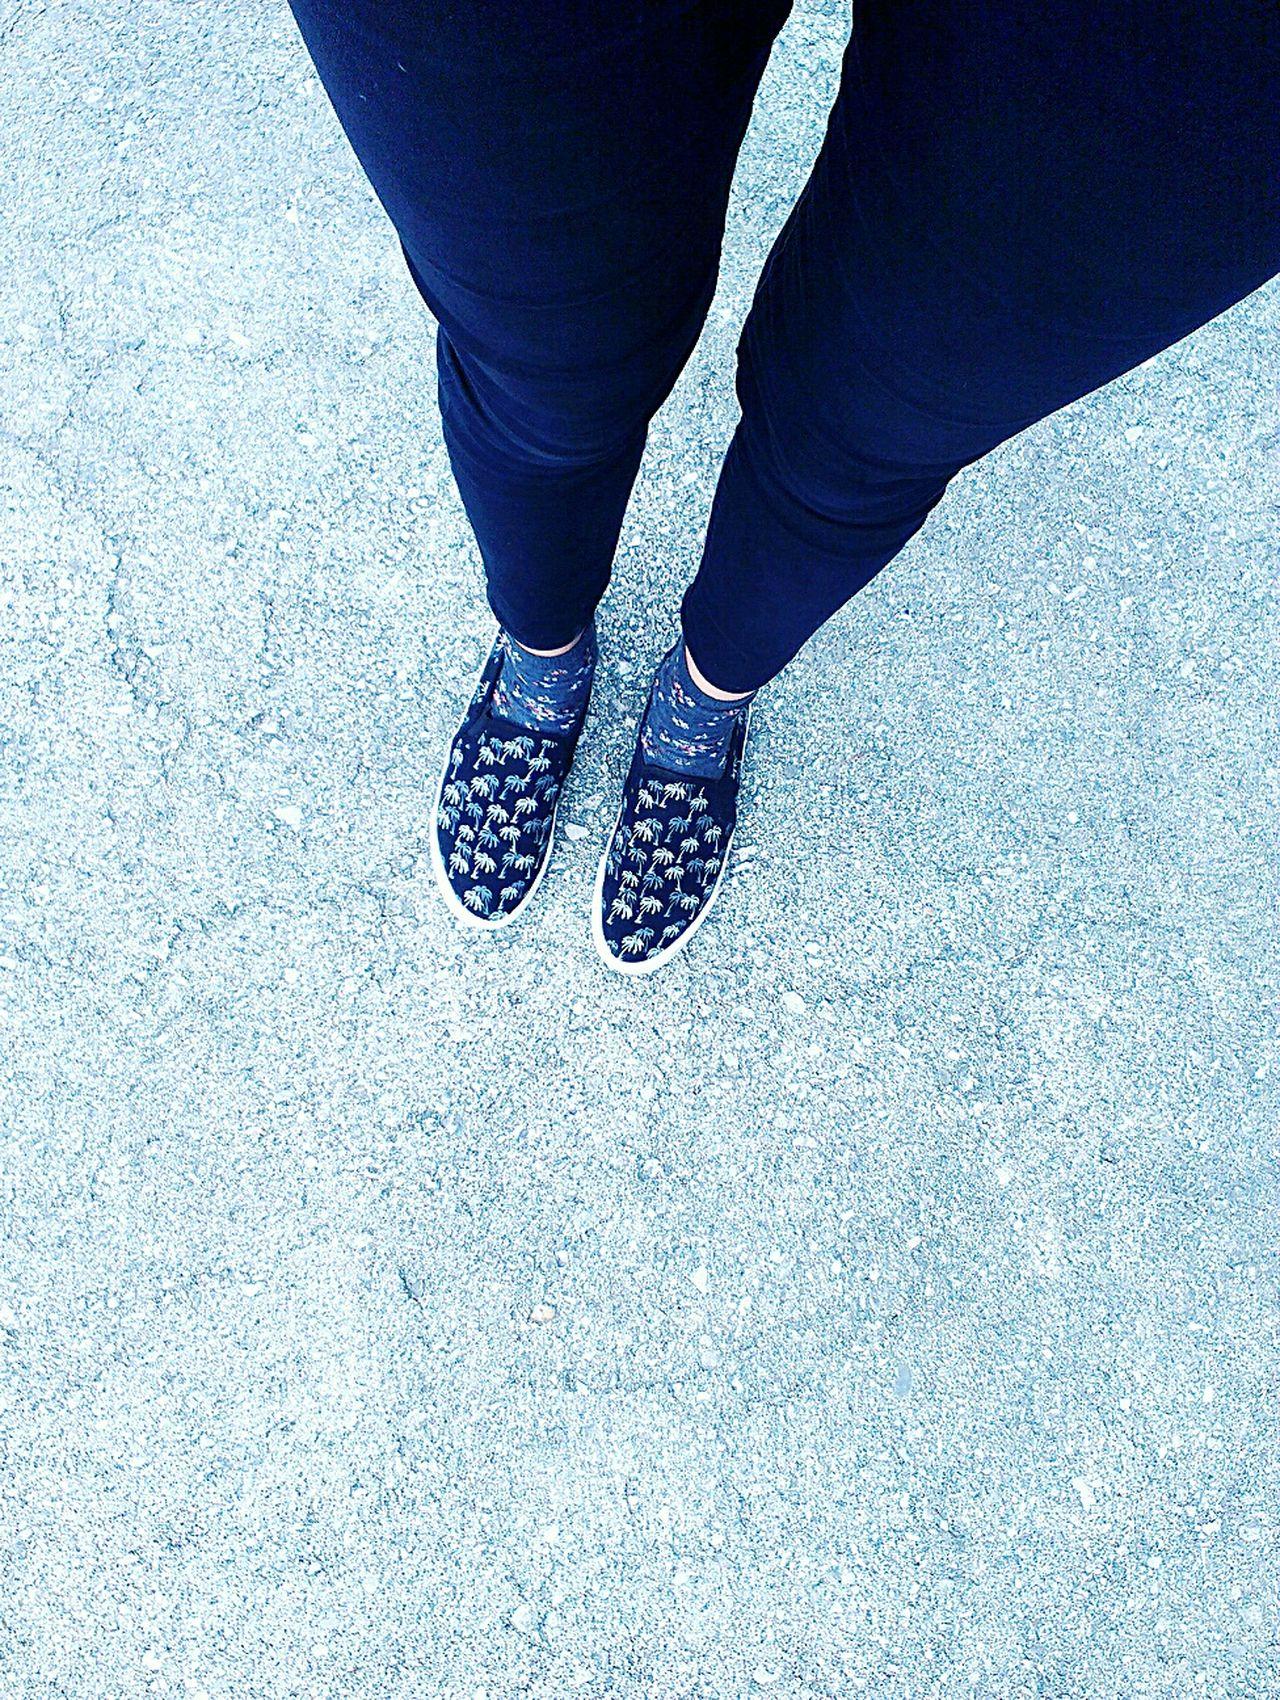 zasa mám zabité ponožky :-D :-D :-D :-P